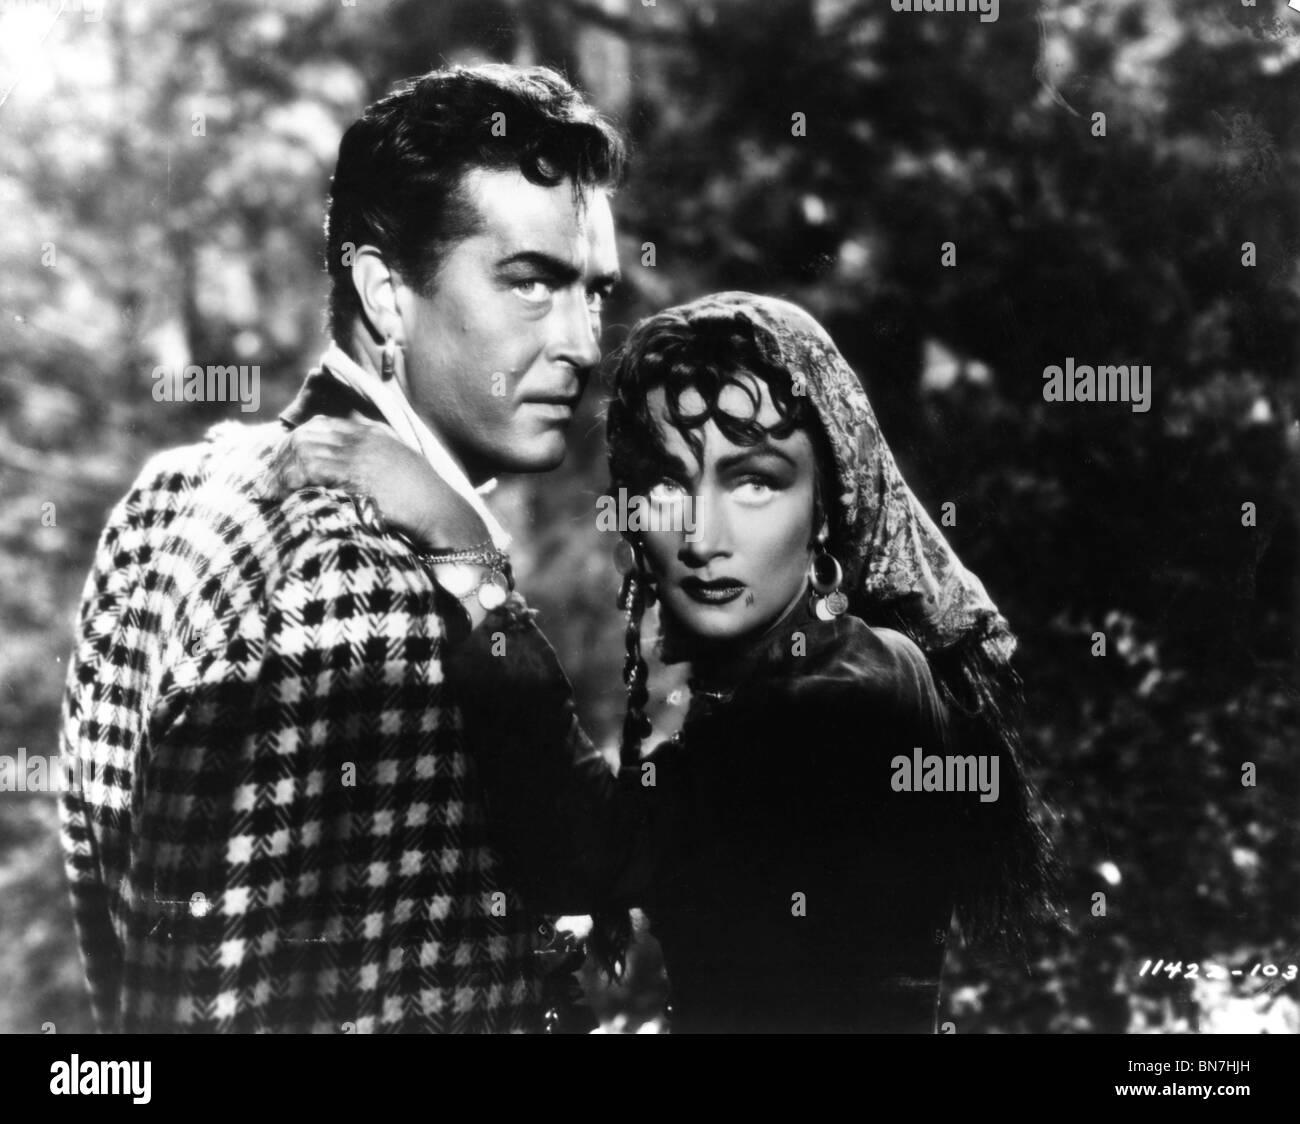 The Golden Earrings 1947 Ray Milland Marlene Trich Mitc